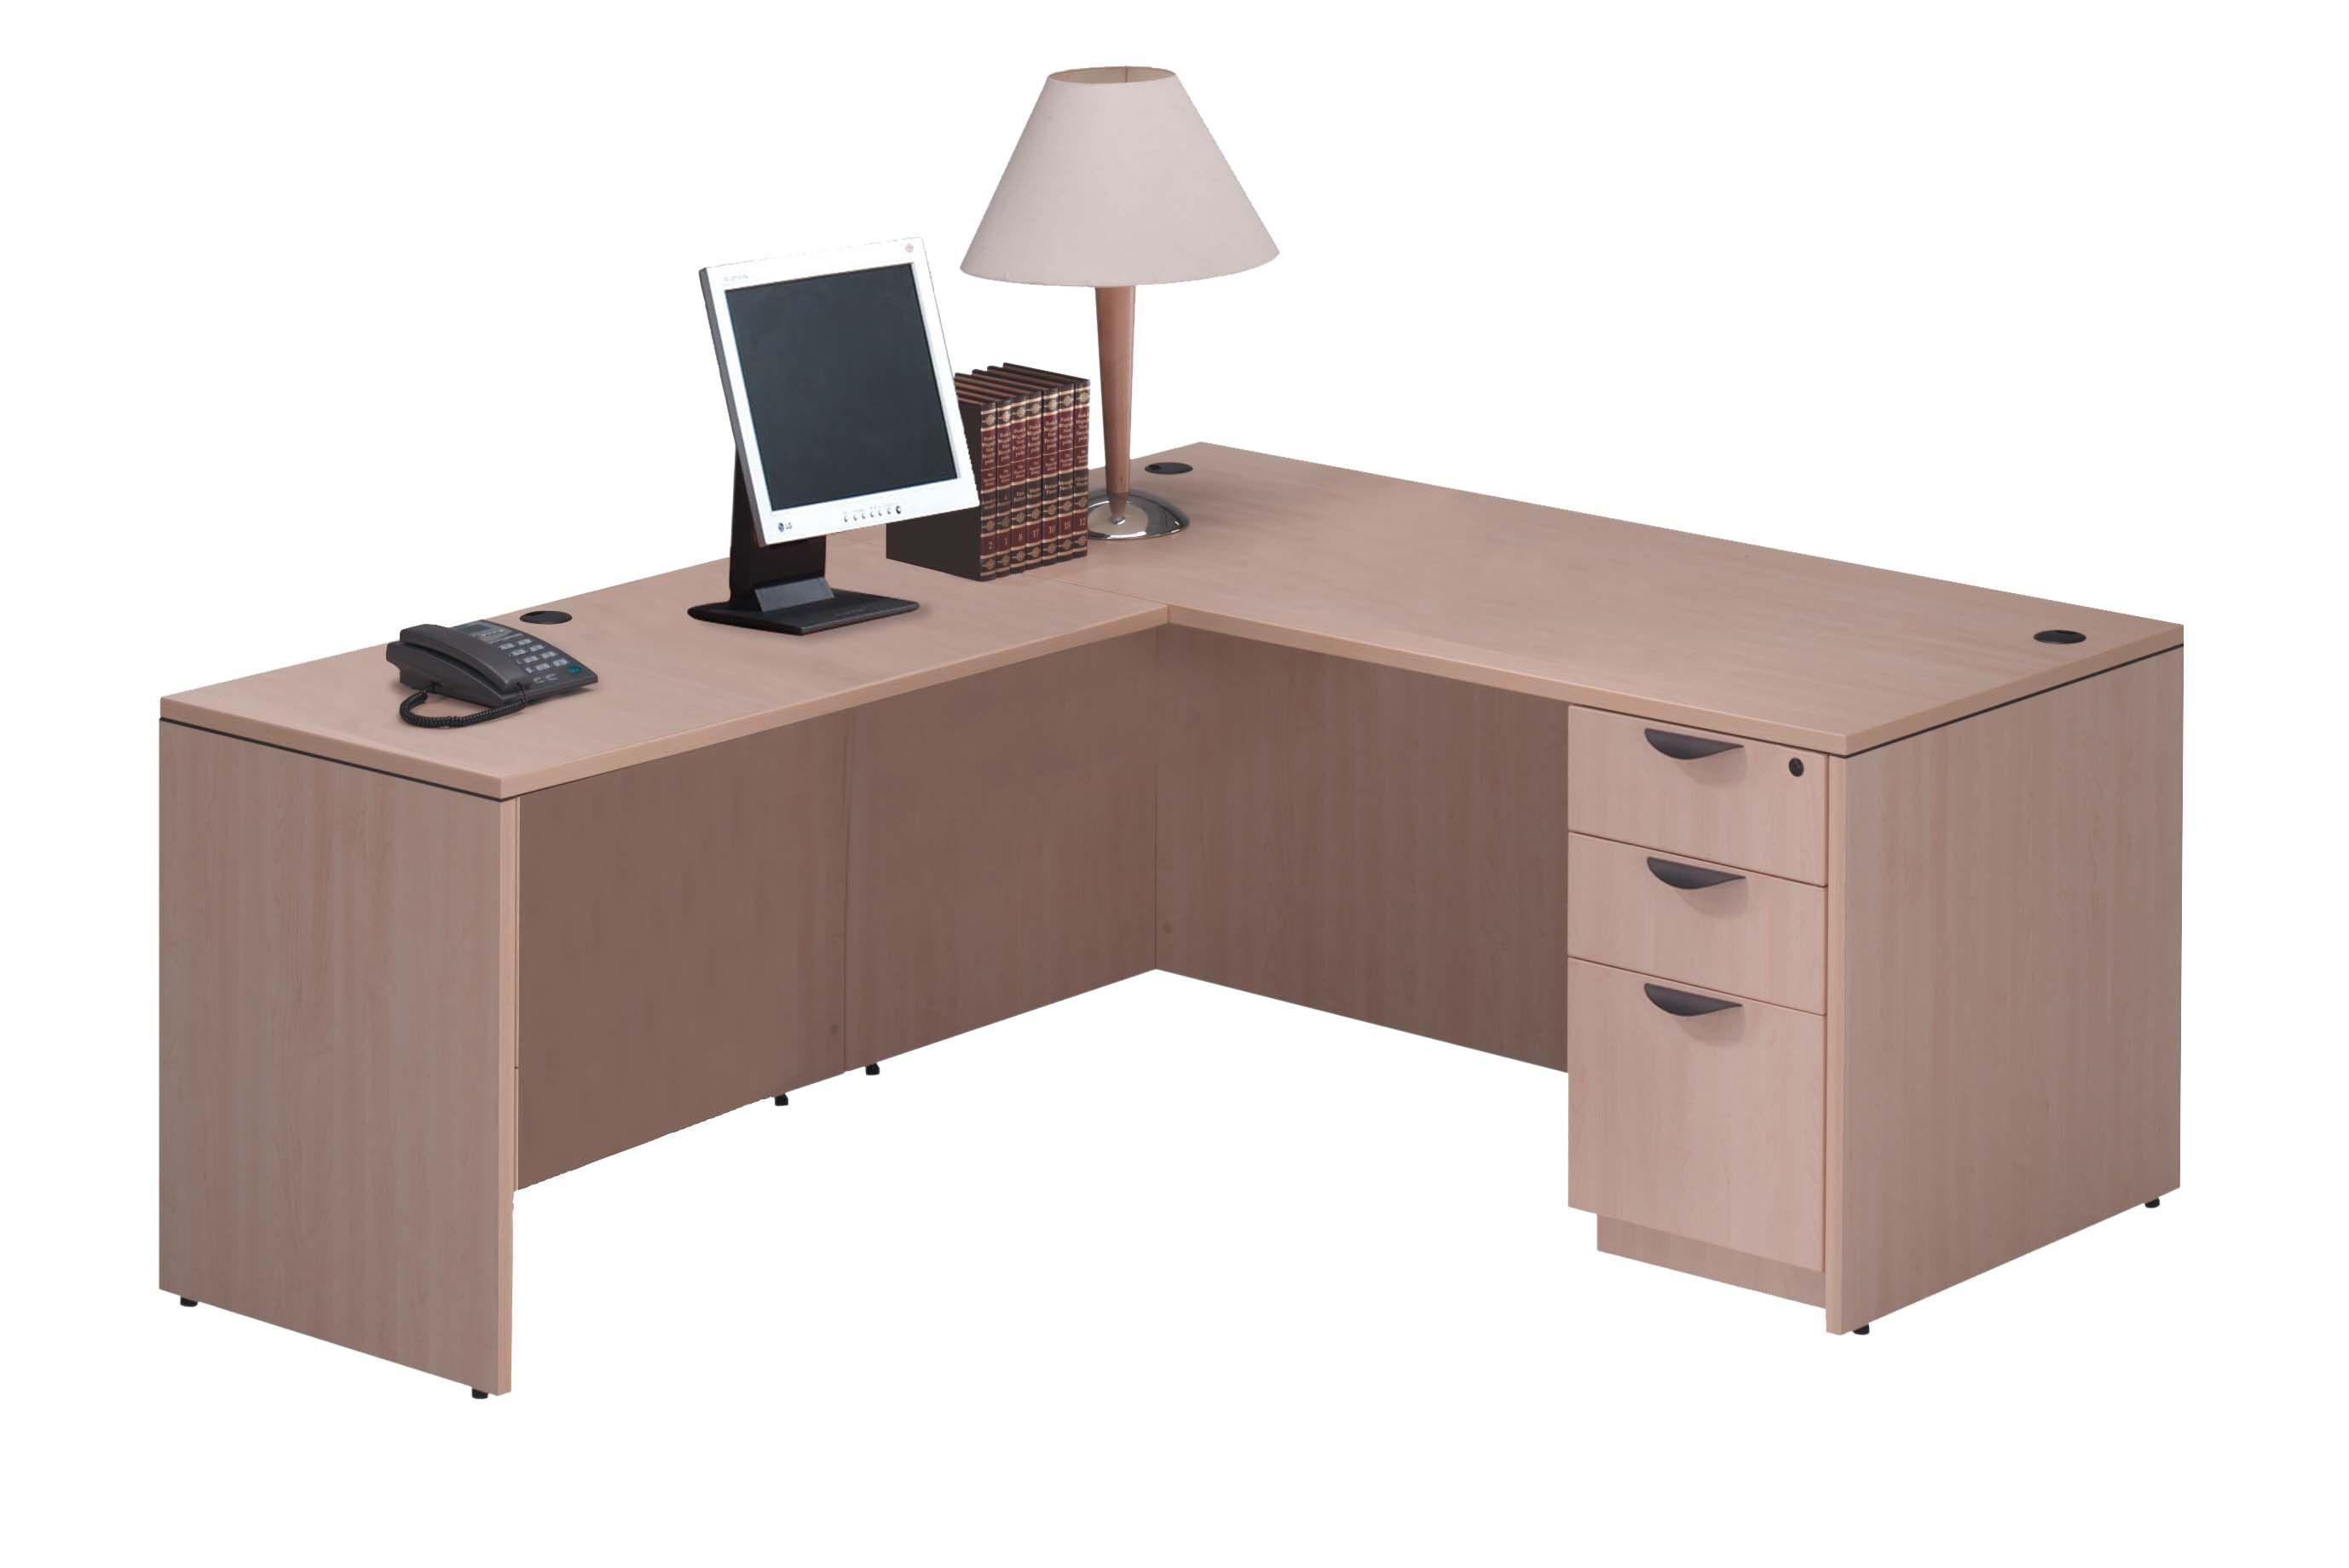 Furniture Box Maple Laminate L Shaped Desk With Box Box File Pedestal Color